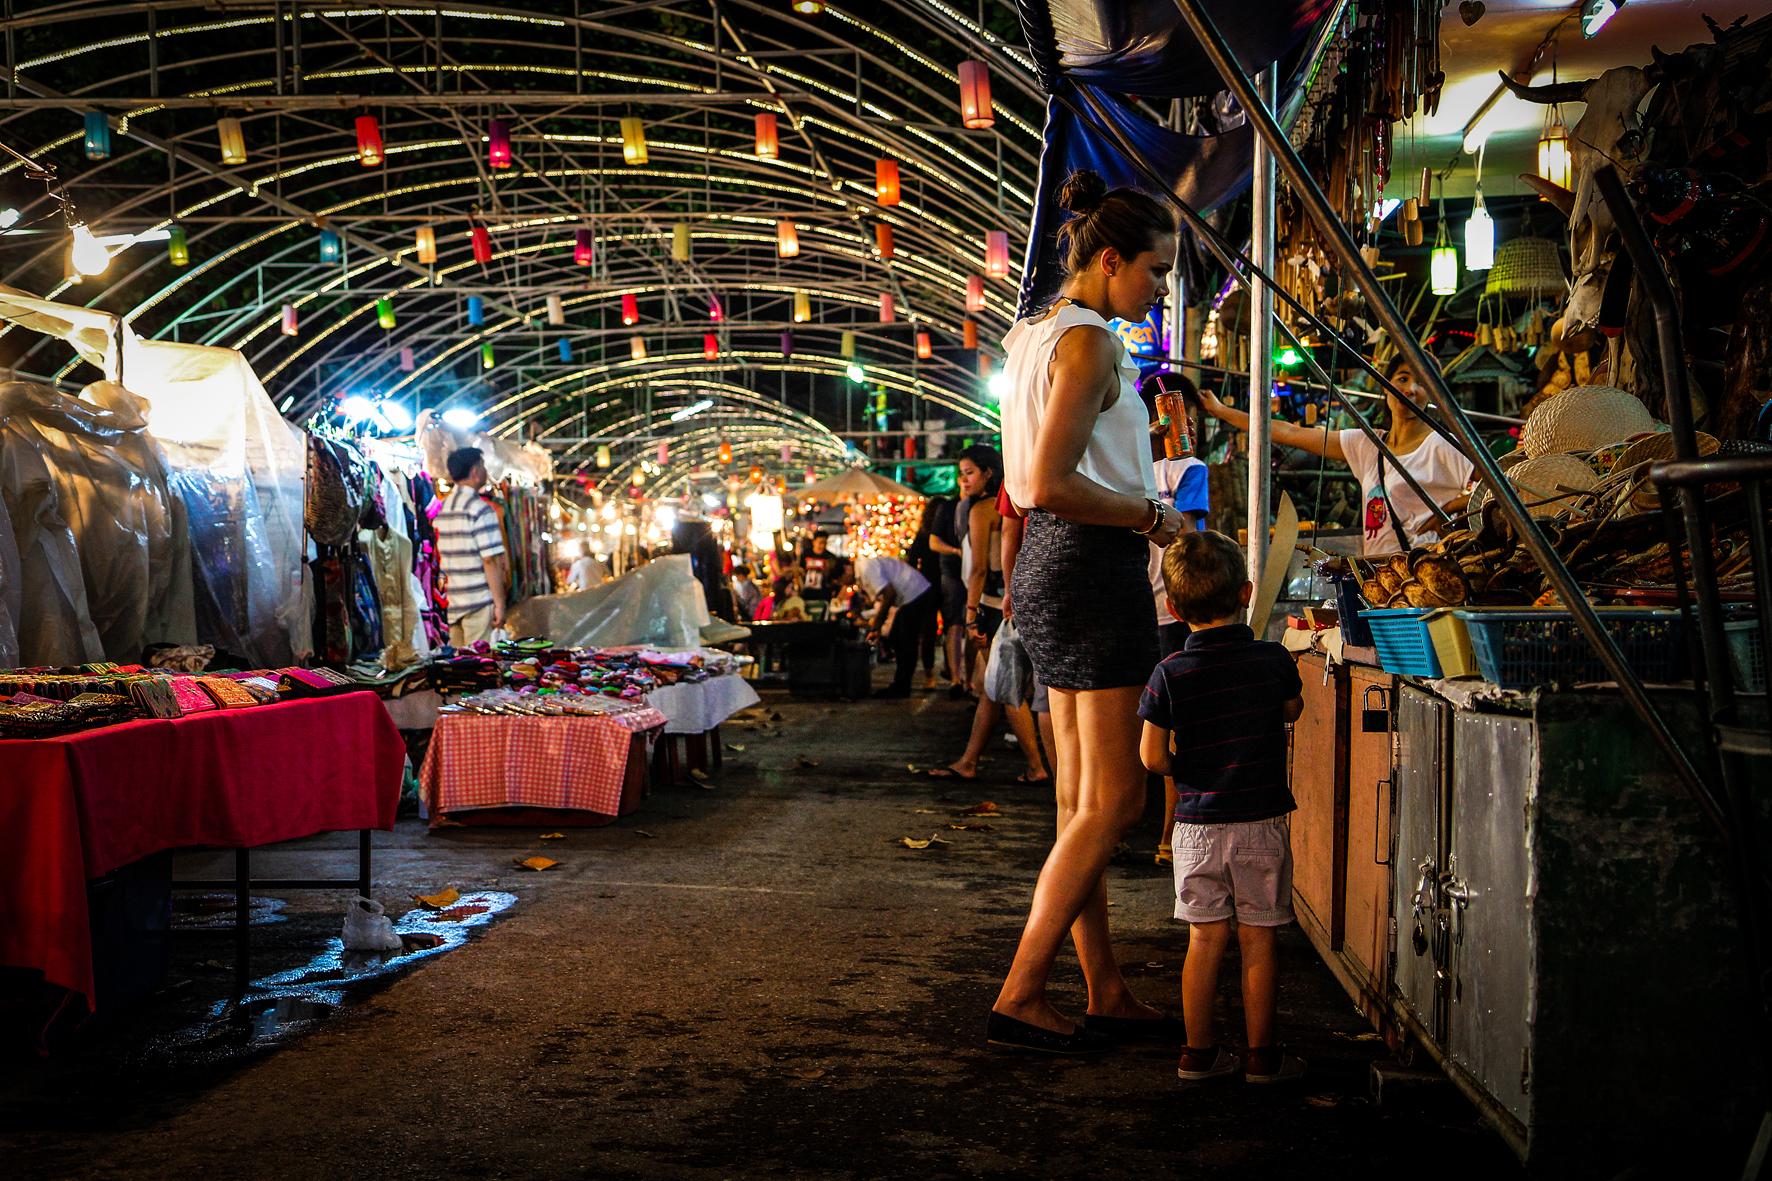 Reizen met Kinderen Thailand Chiang Mai - Night Market2.jpg